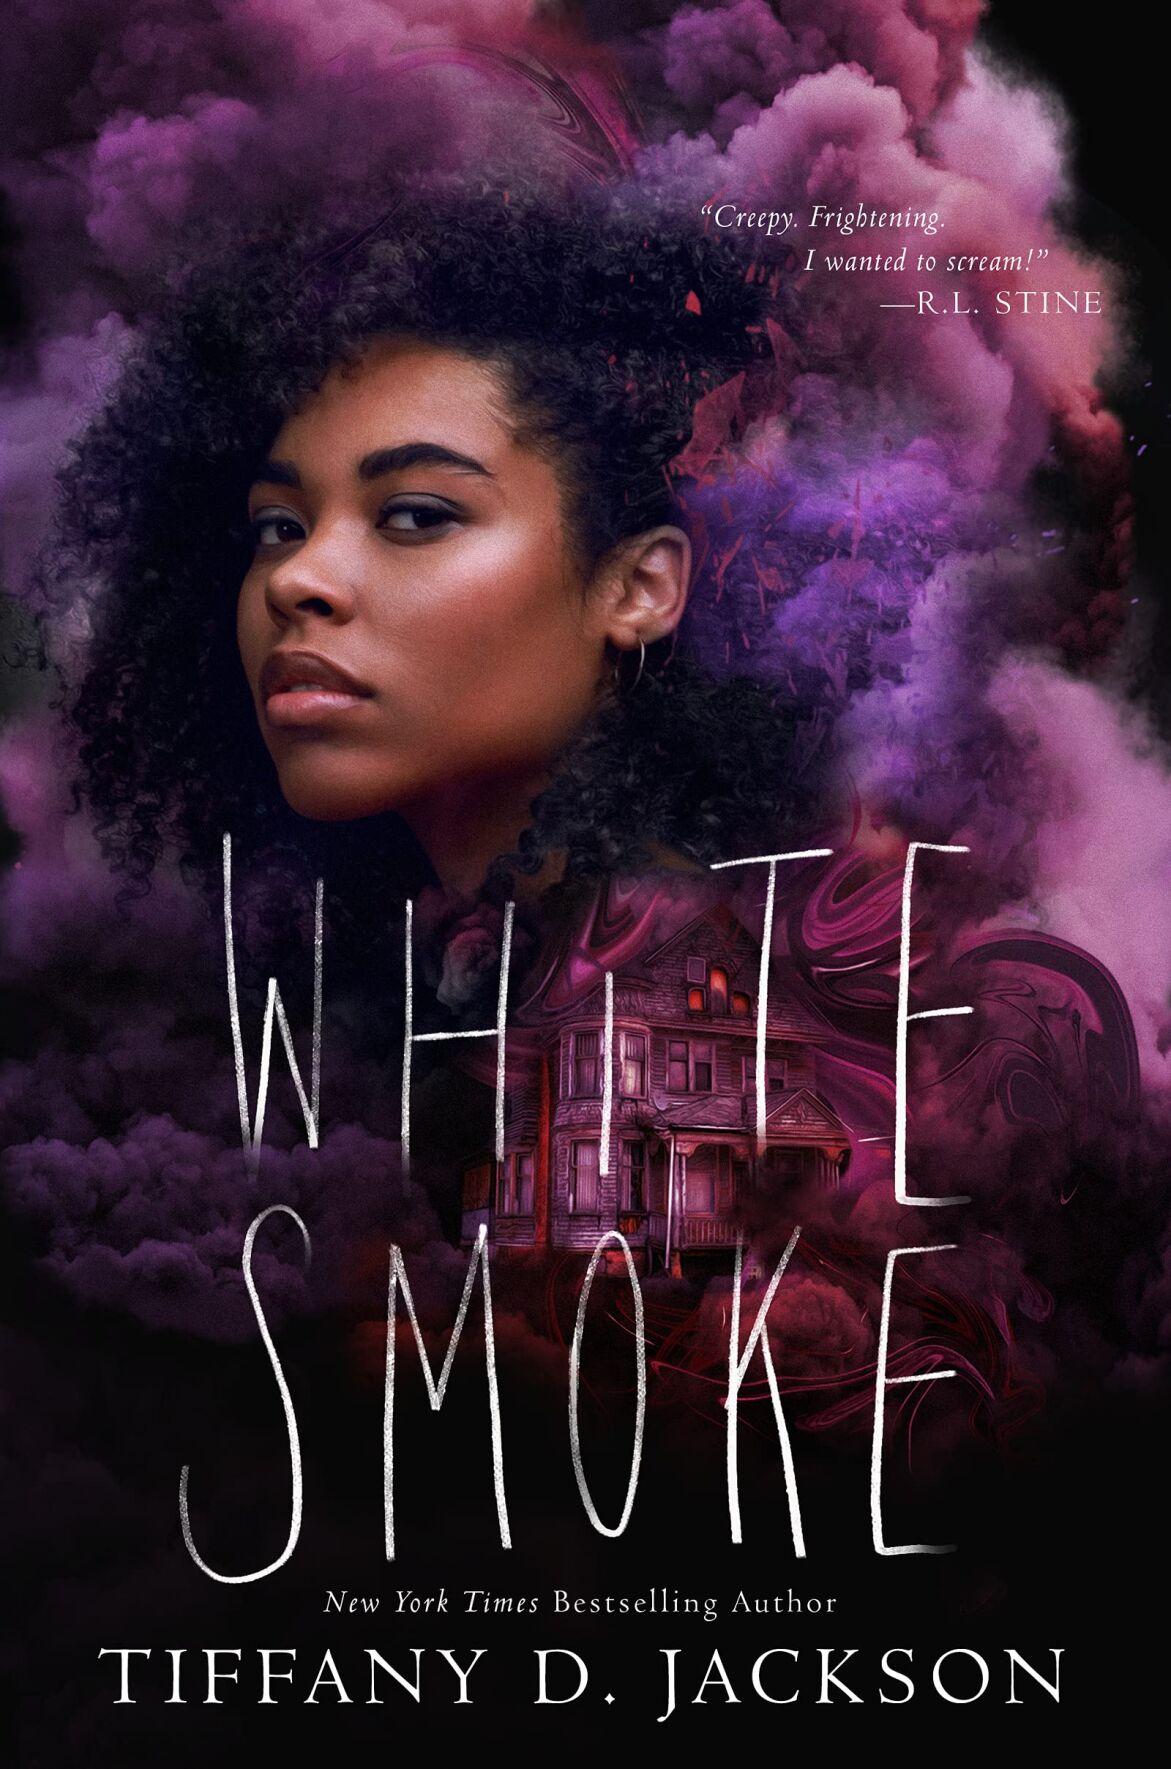 White Smoke Tiffany D. Jackson.jpg